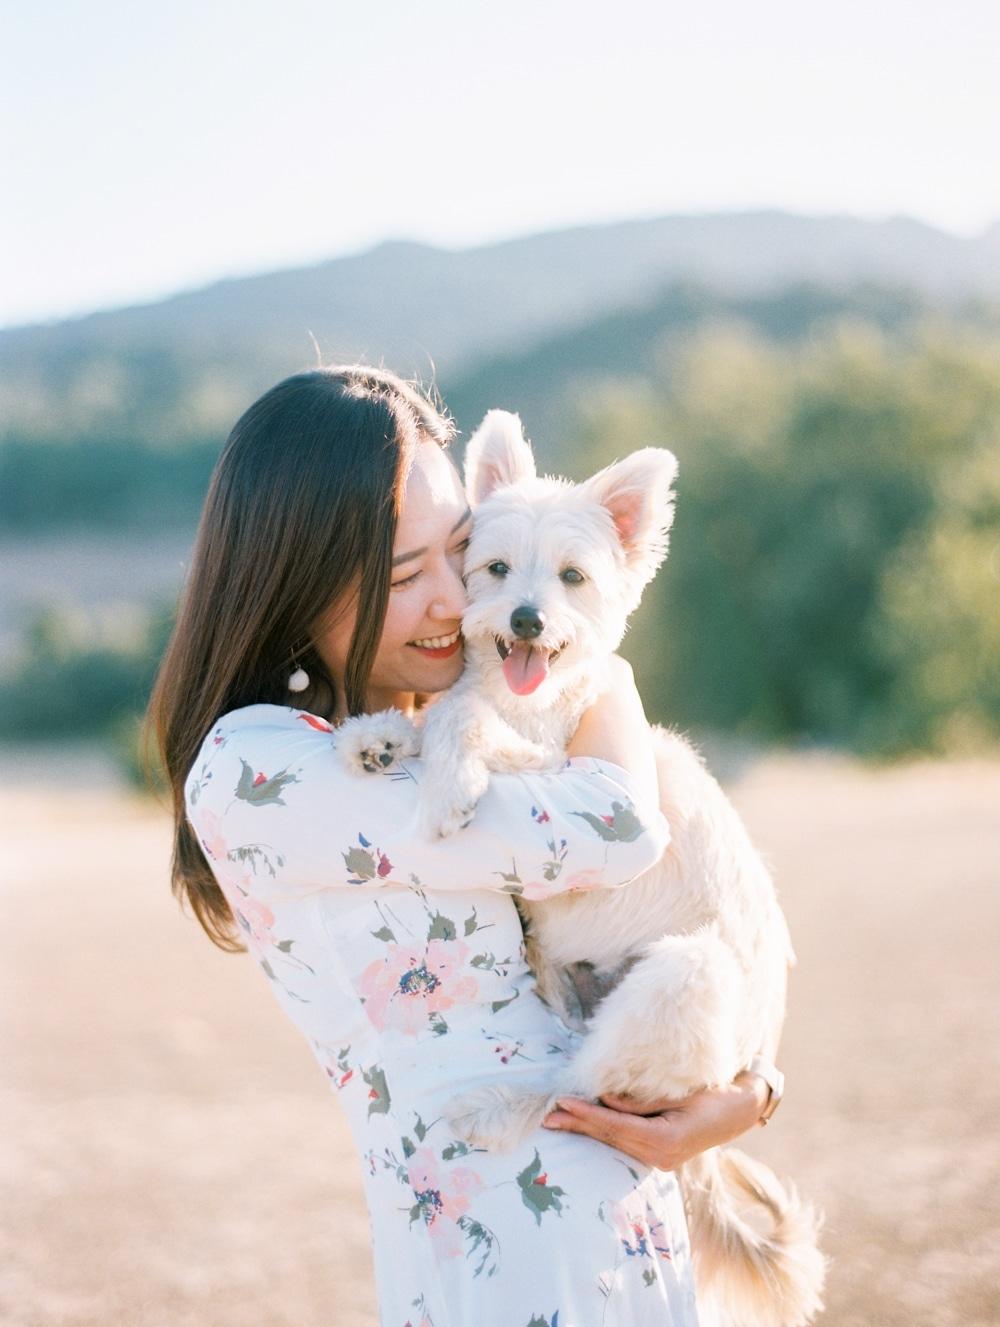 Kristin-La-Voie-Photography-california-wedding-photographer-dog-session-rancho-san-antonio-los-altos-23